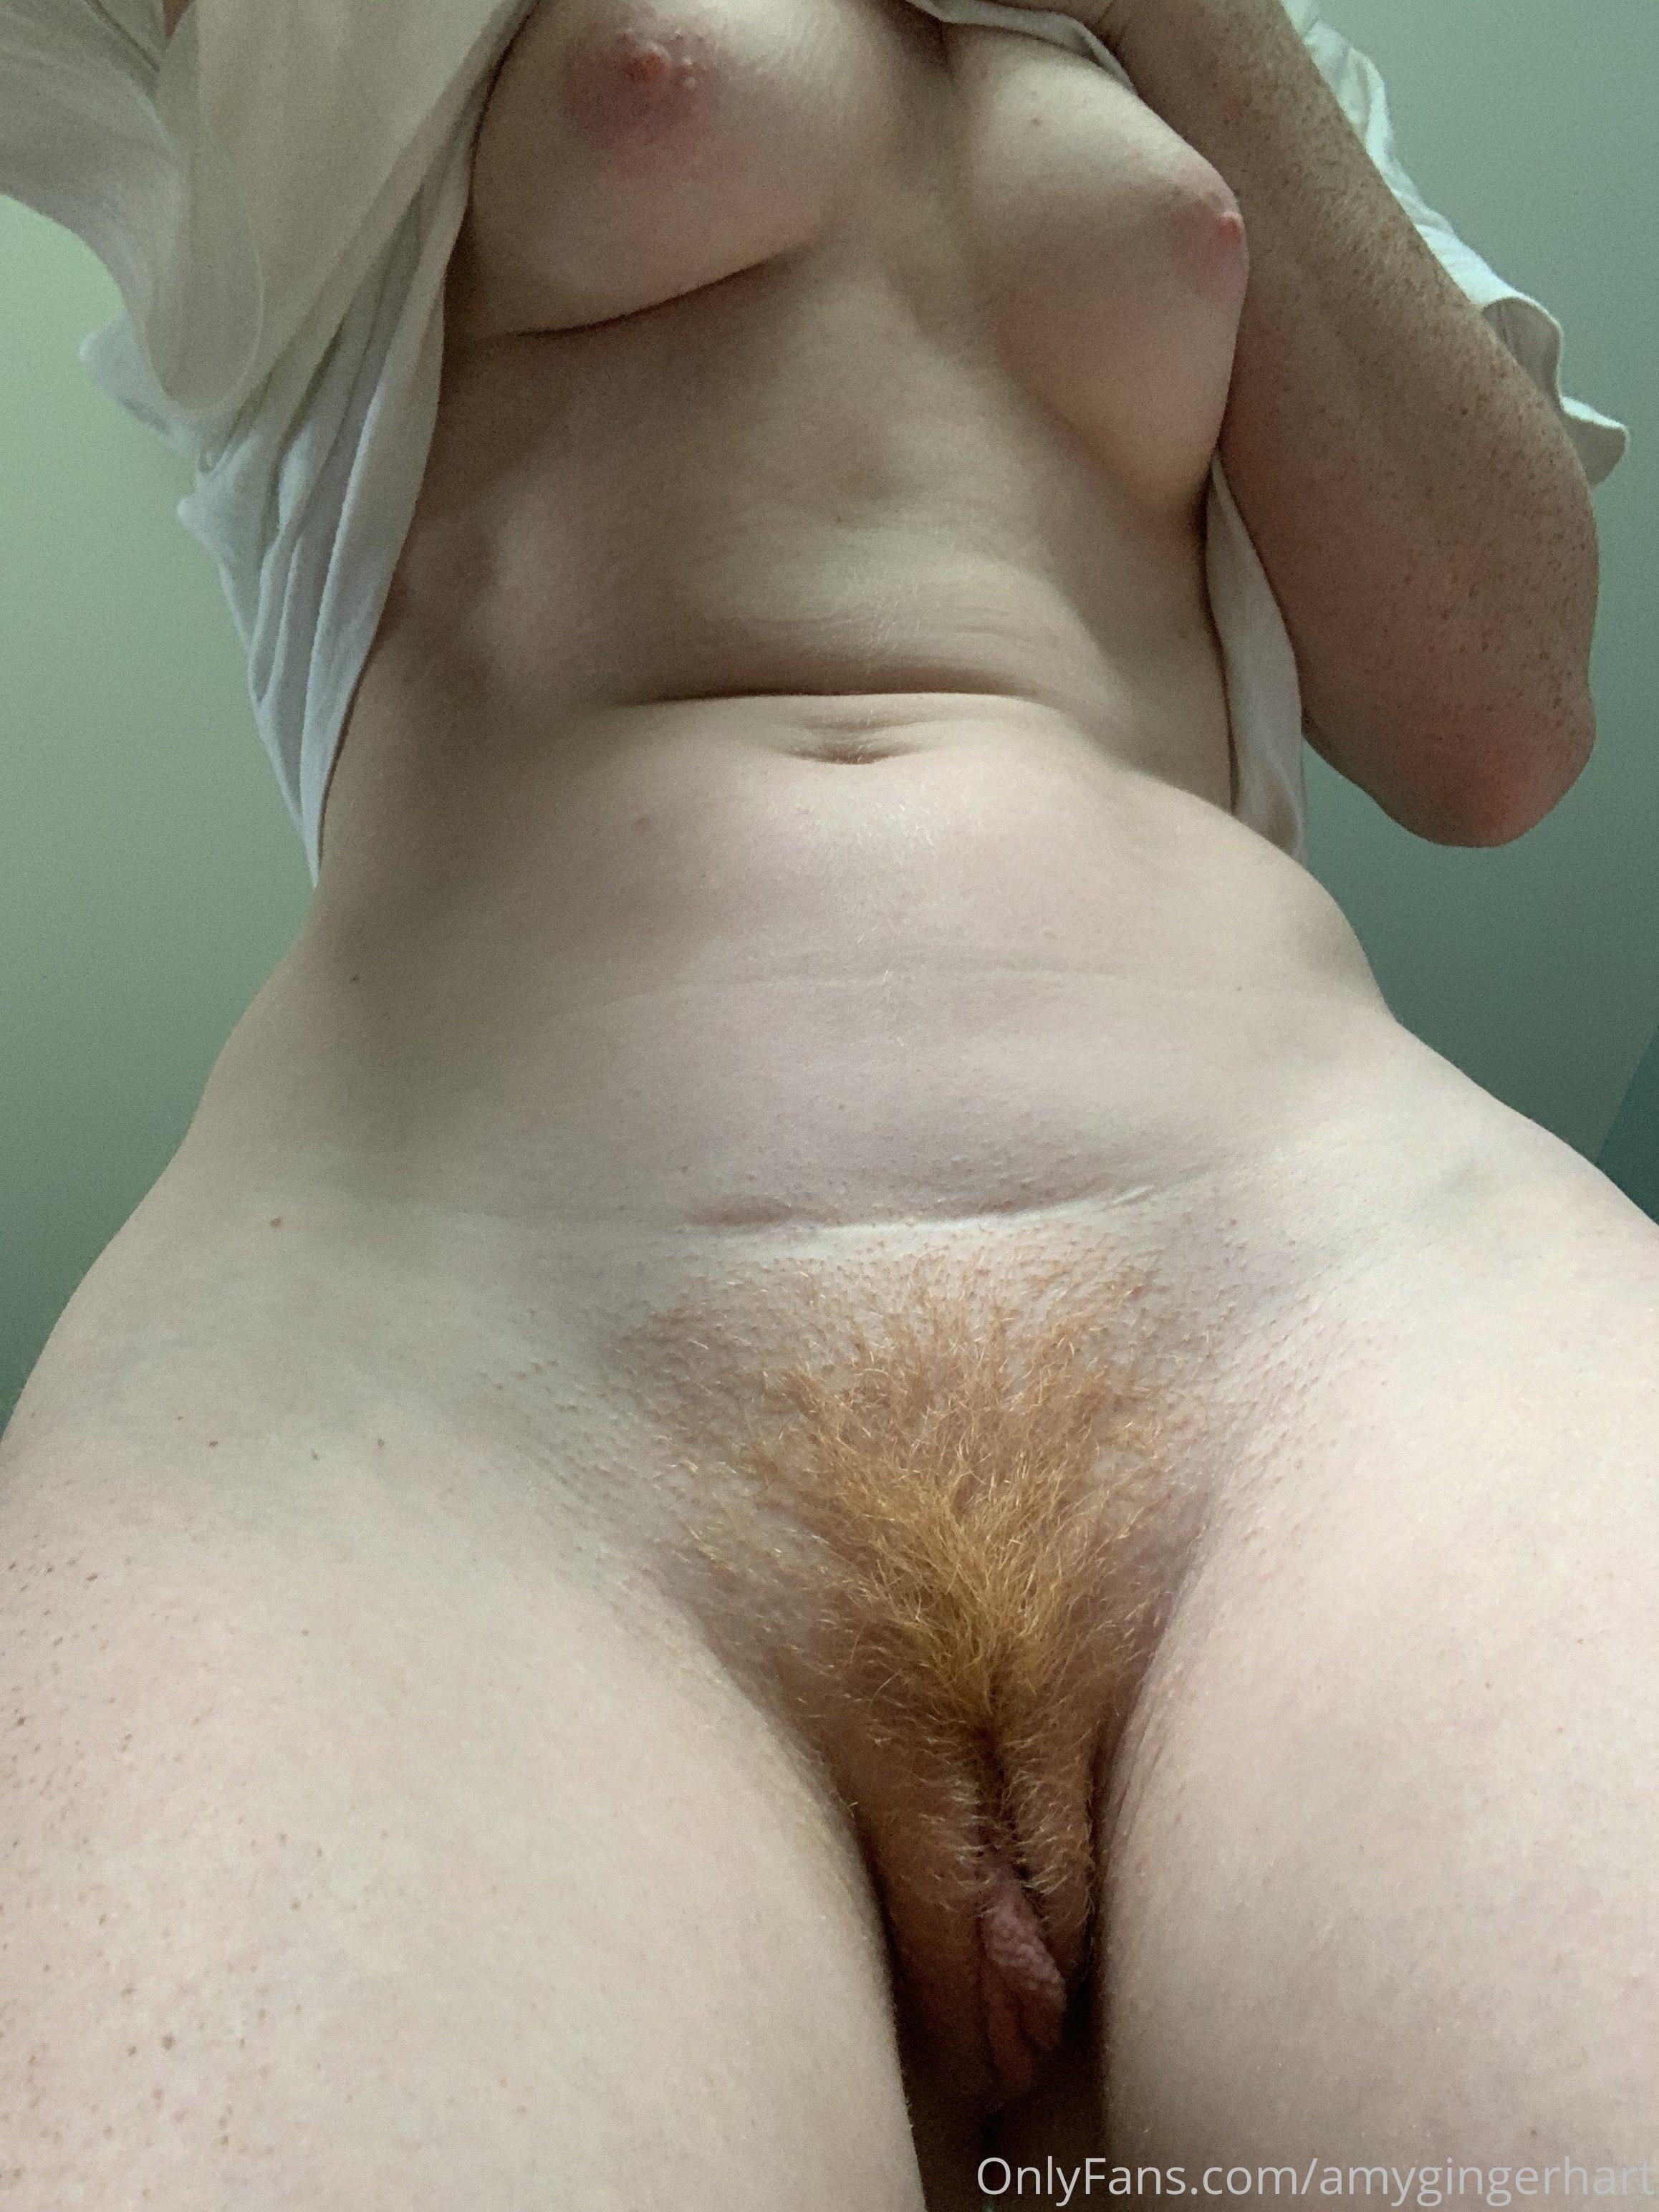 Amy Hart, Amygingerhart, Onlyfans 0279